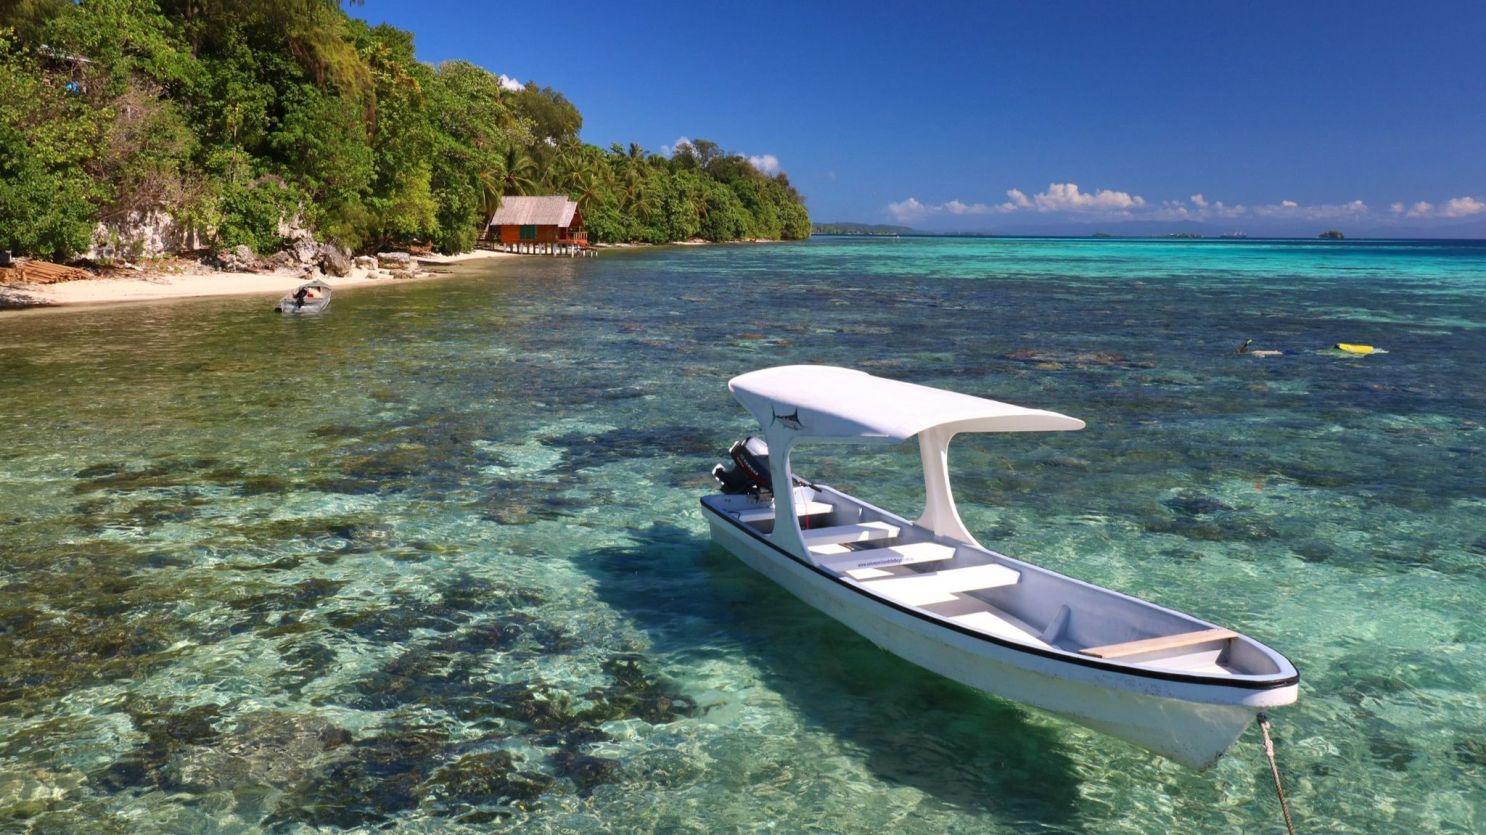 Một góc Quần đảo Solomon năm 2018. Ảnh: Sandiego Union Tribune.